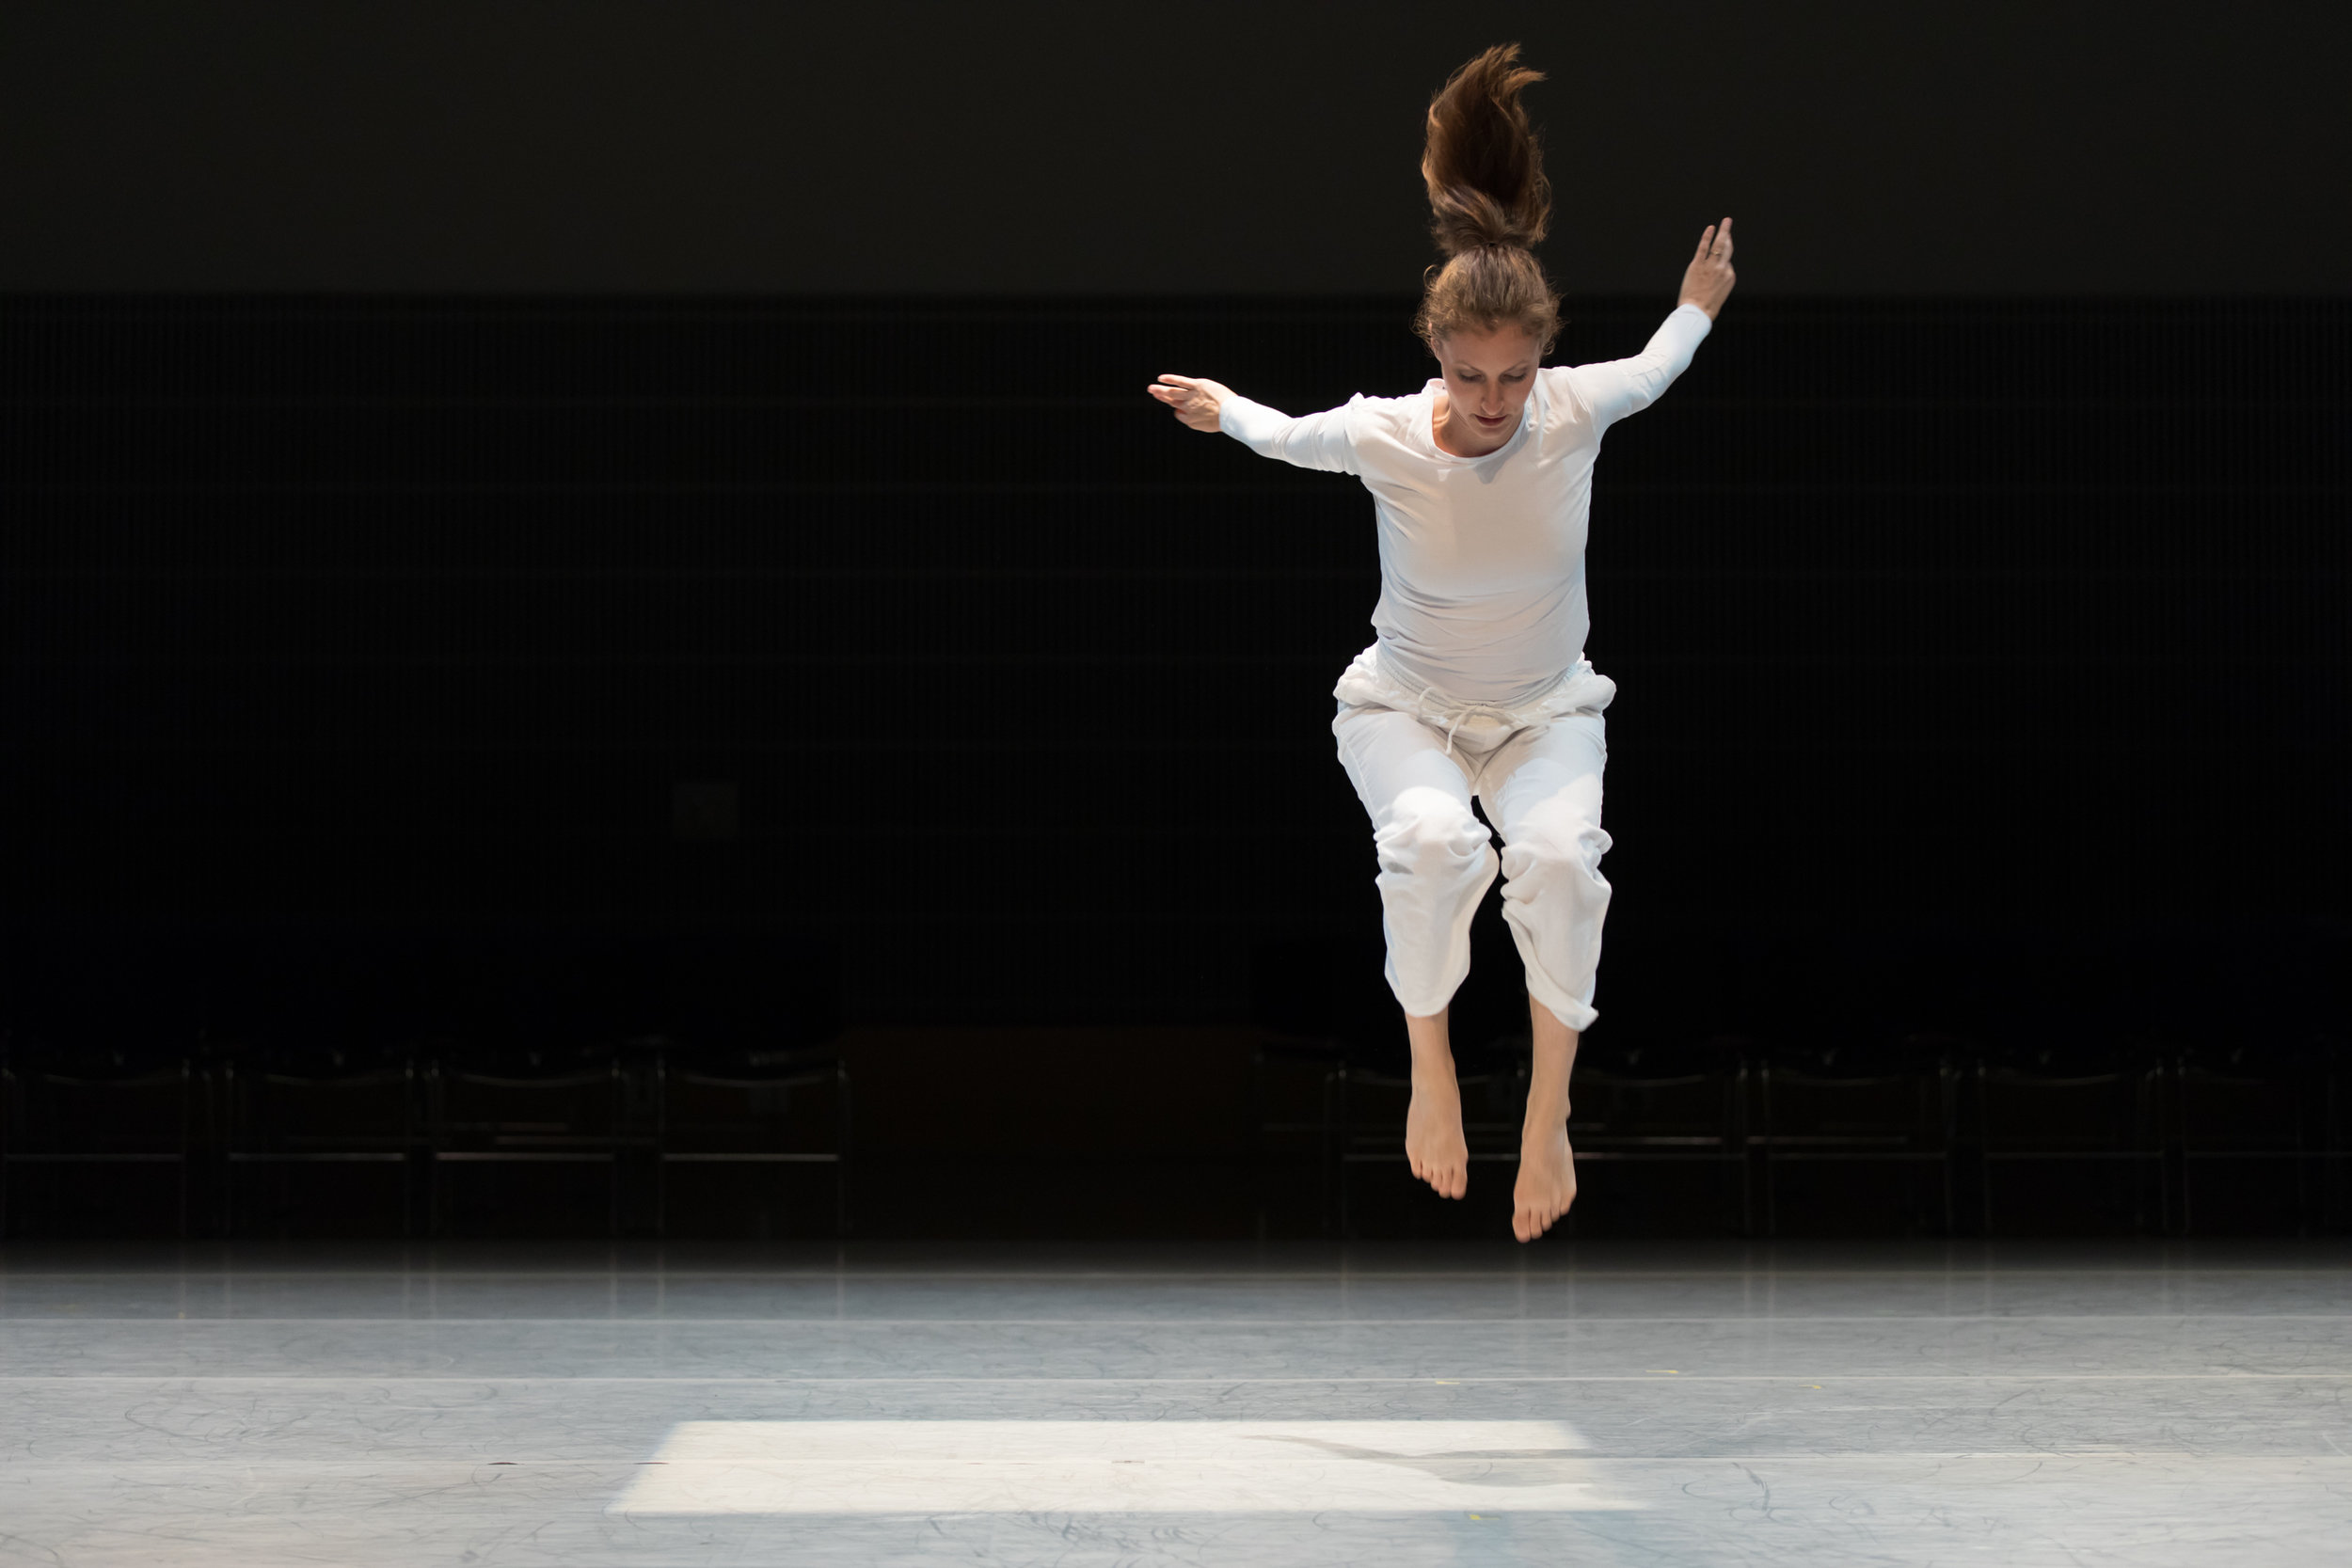 Dancer Sarah Chenoweth performs Trisha Brown's  Locus Solo (1975) as part of HMD's 2016 Bridge Project, Ten Artists Respond to  Locus . Photo by Margo Moritz.